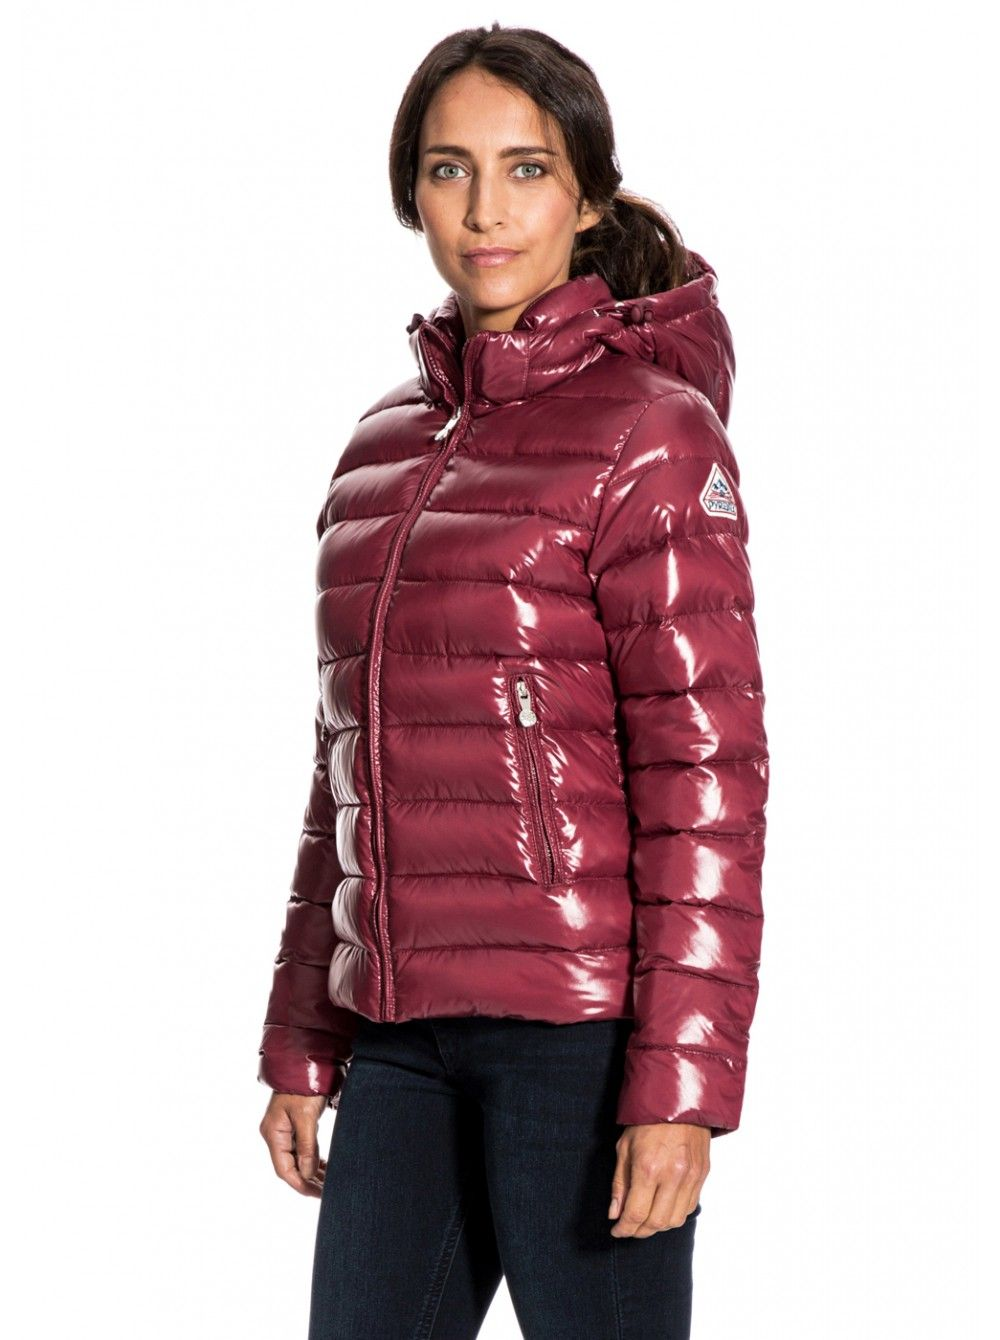 doudoune courte WOMEN PIVOINE Spoutnic Jacket Women - PYRENEX Jackor För  Kvinnor dd5ea8fa5a29a